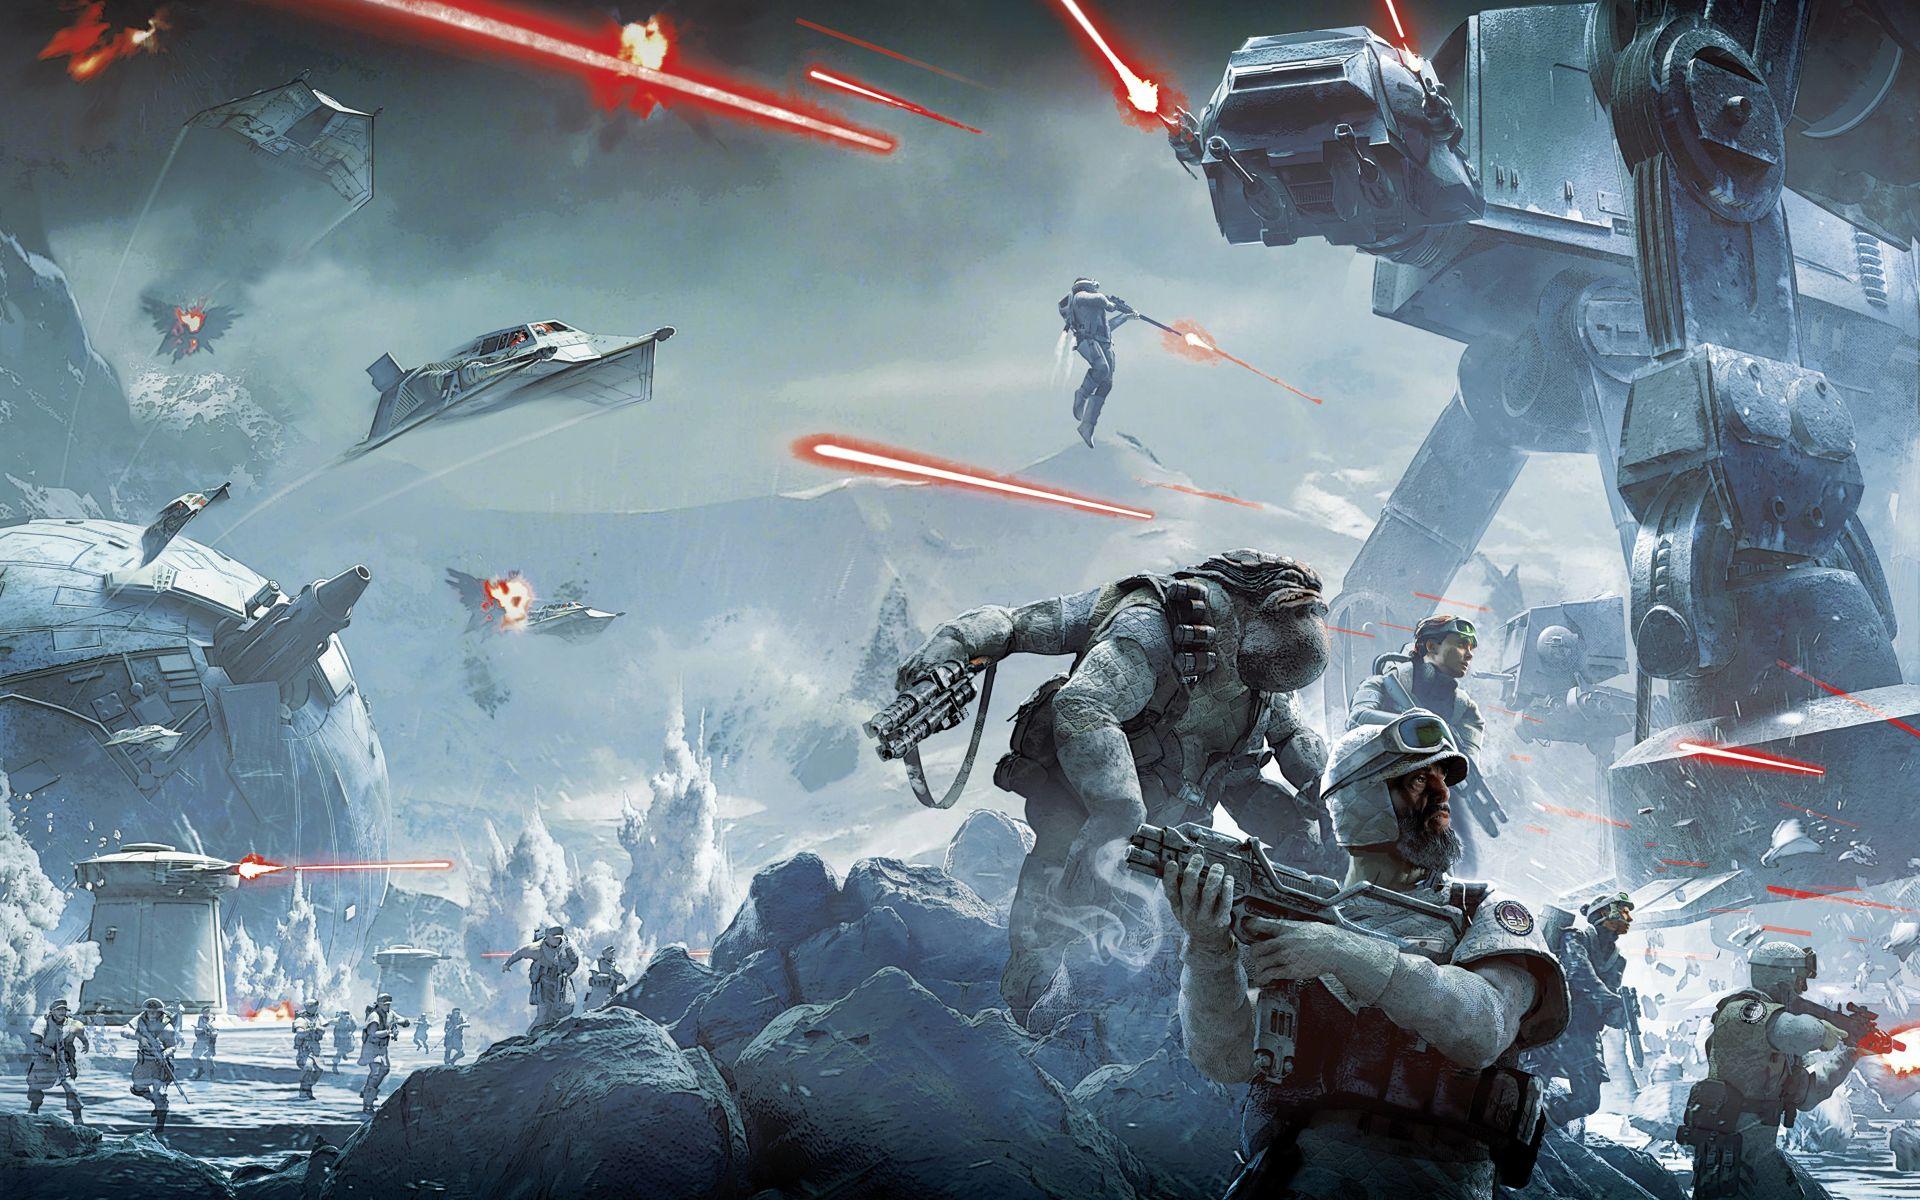 Star Wars Screensaver vertical wallpaper hd